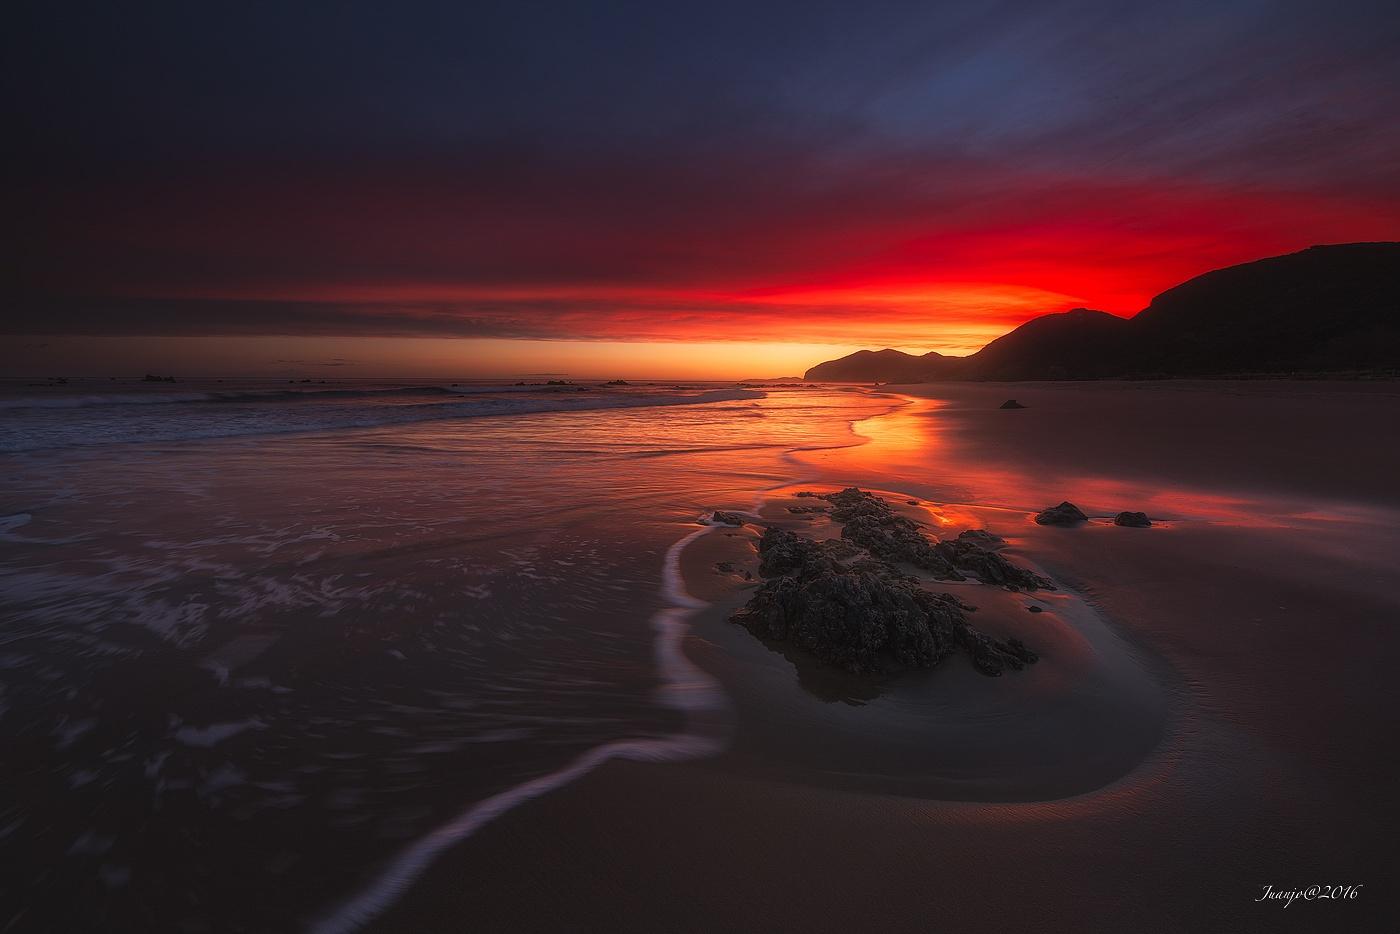 Red sky by Juanj0